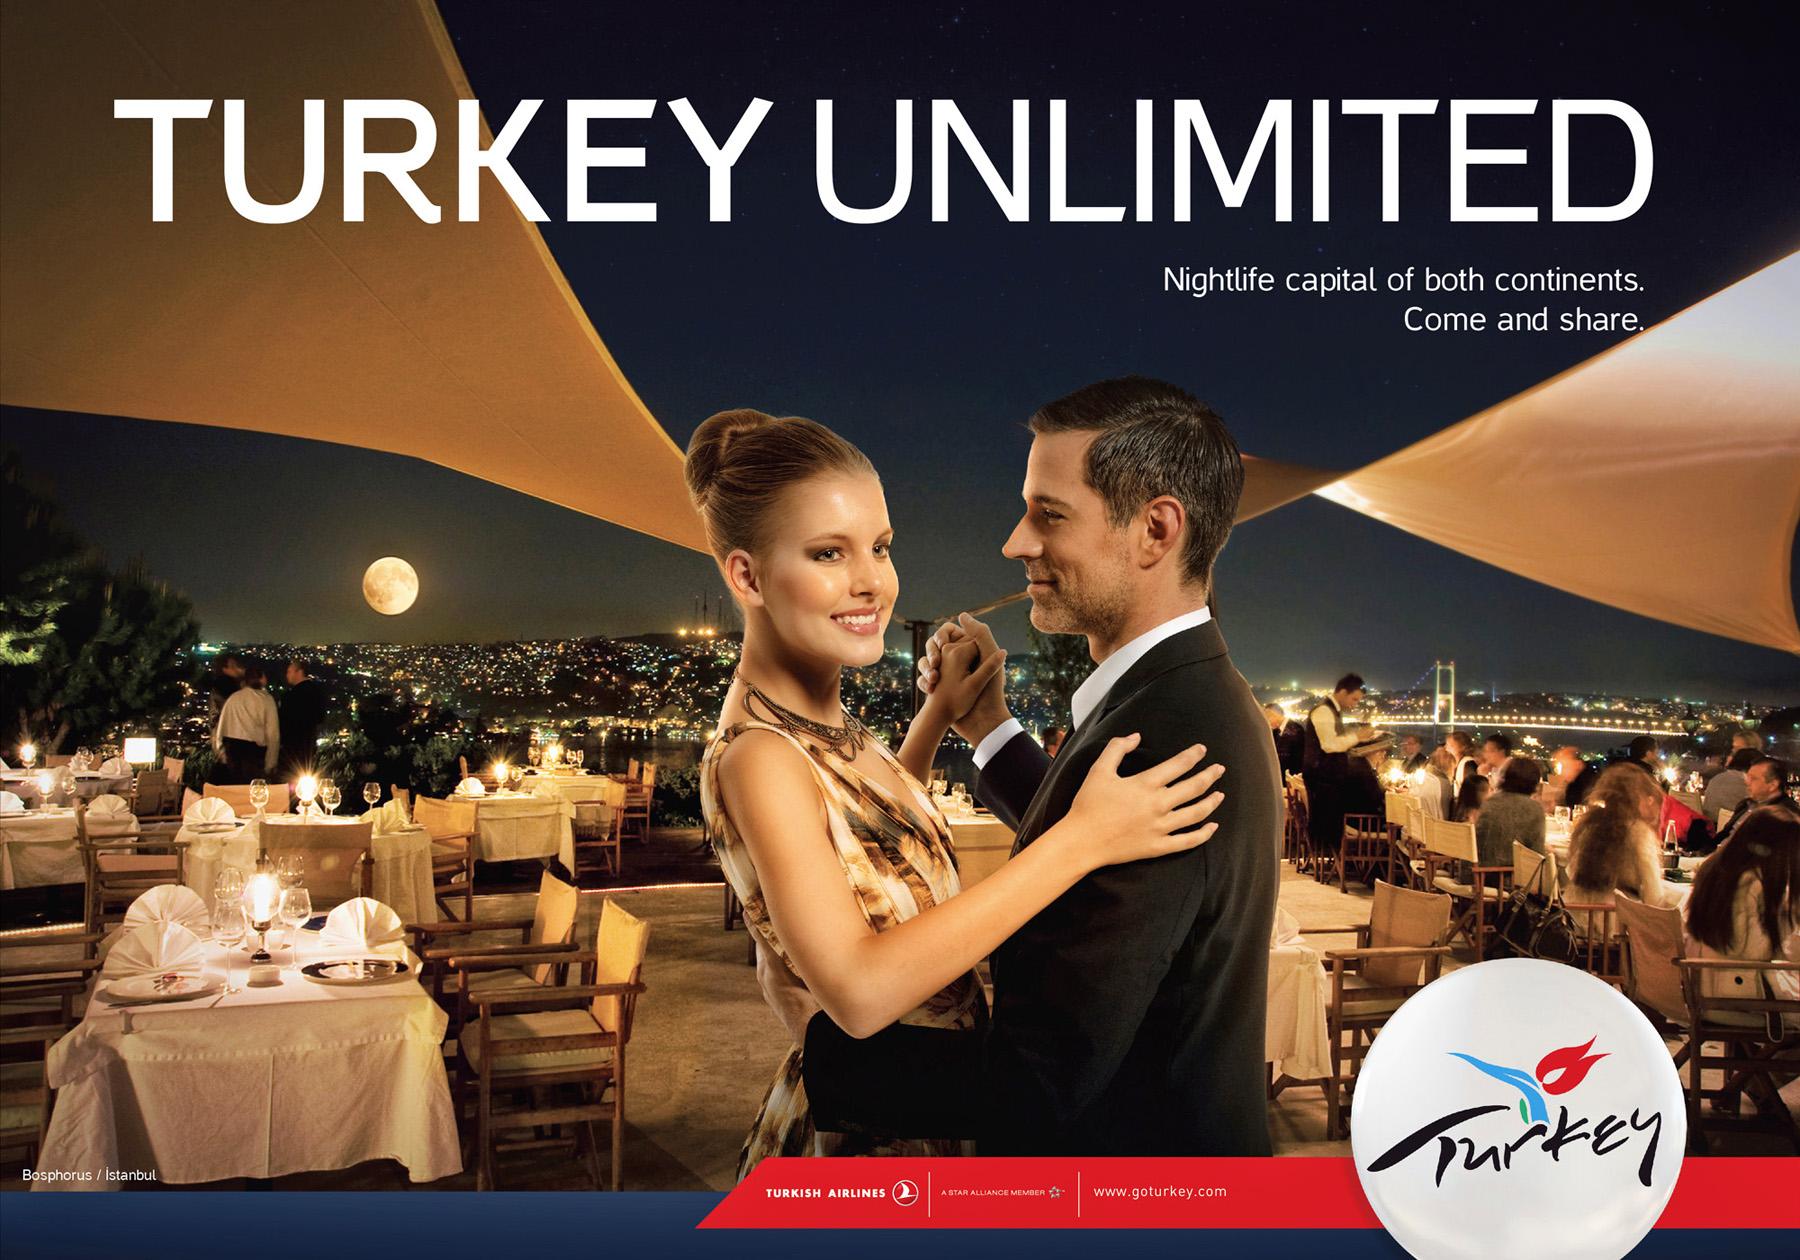 Turkey_2013_11